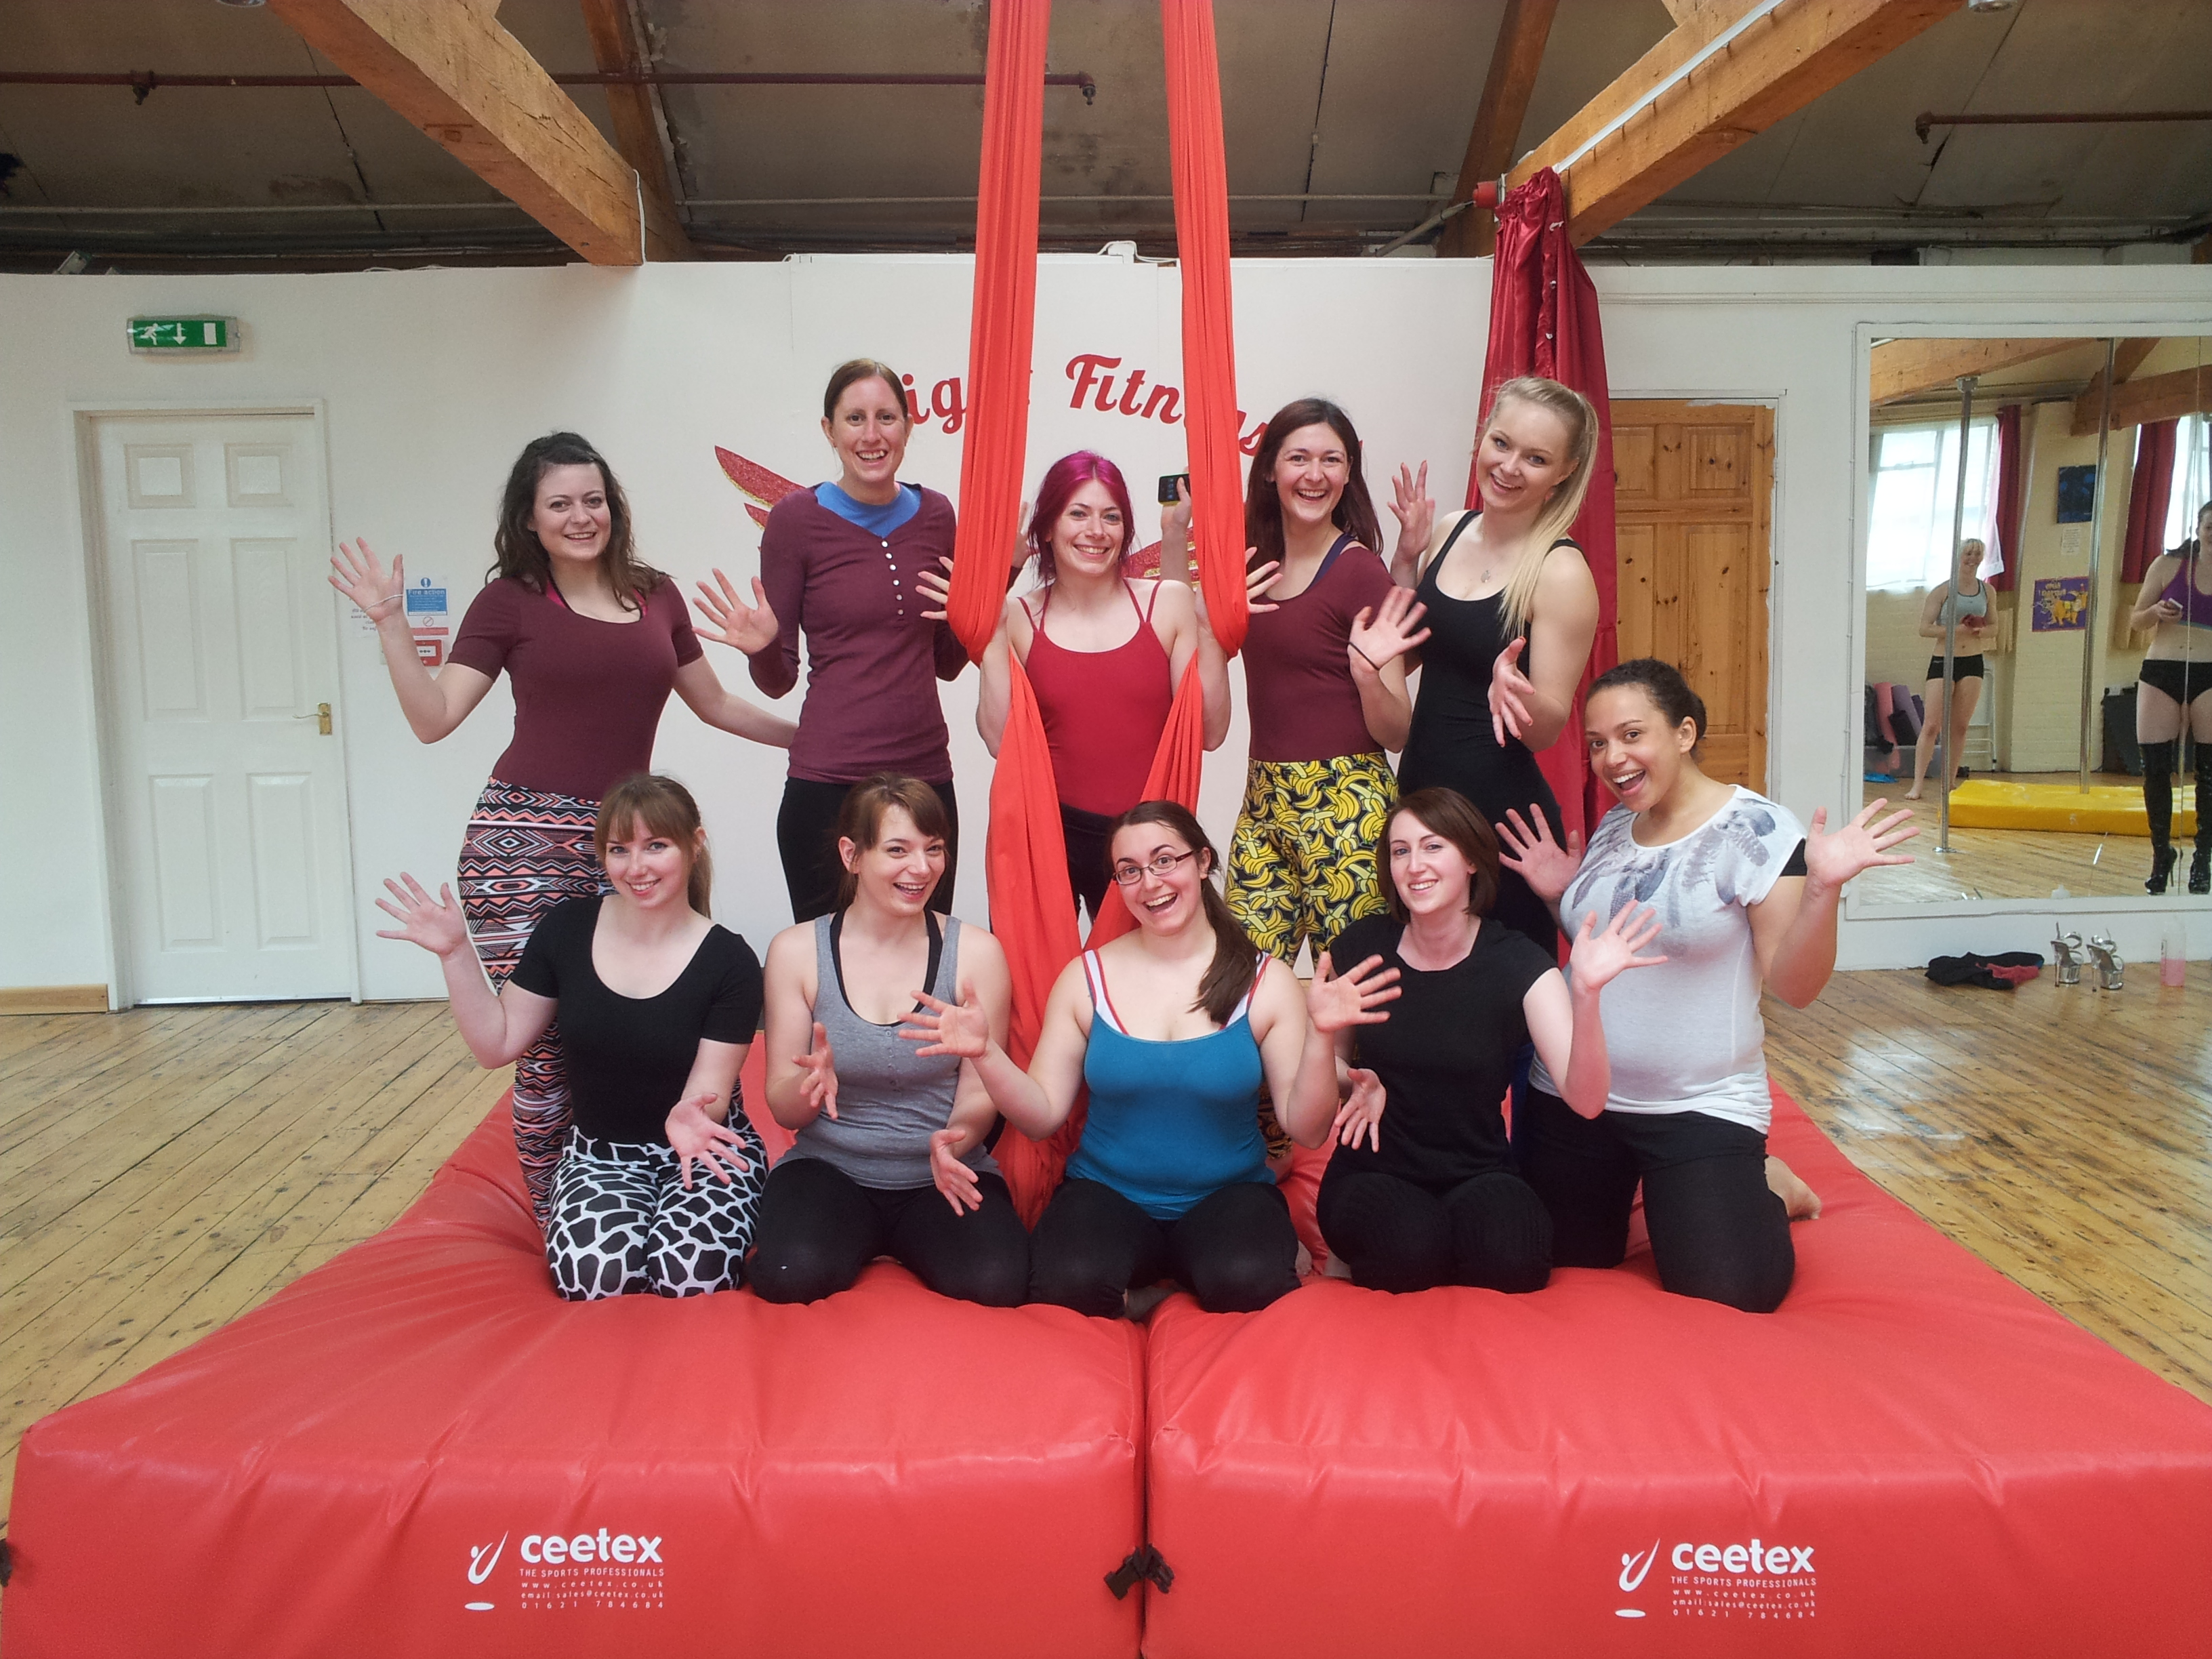 Aerial silks classes Leicester flight fitness